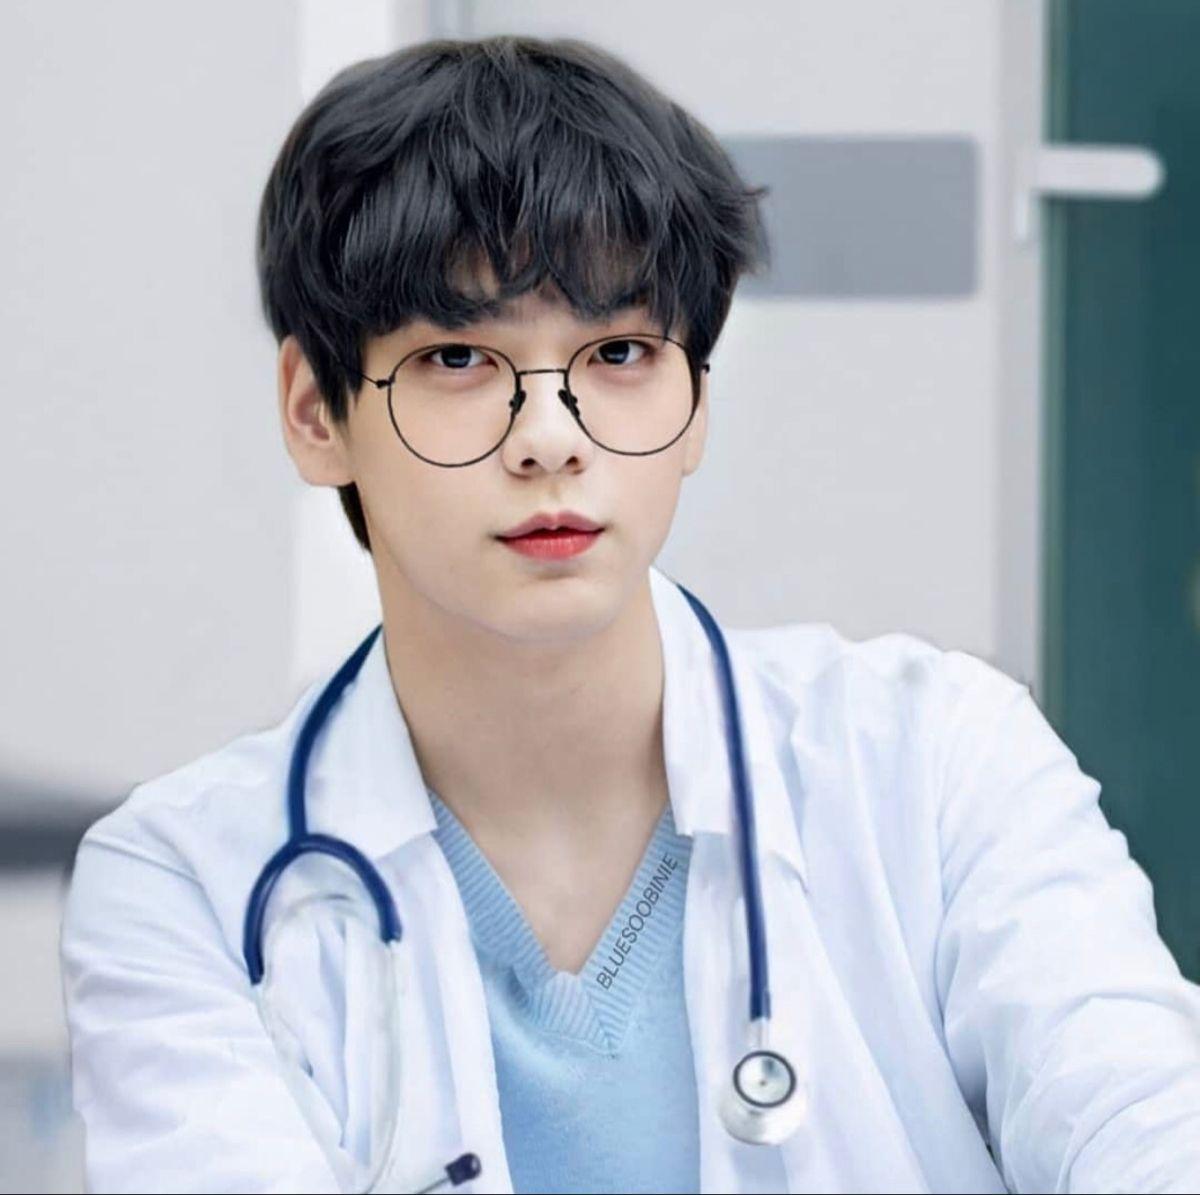 Doctor Sobein Doctor Visual Txt